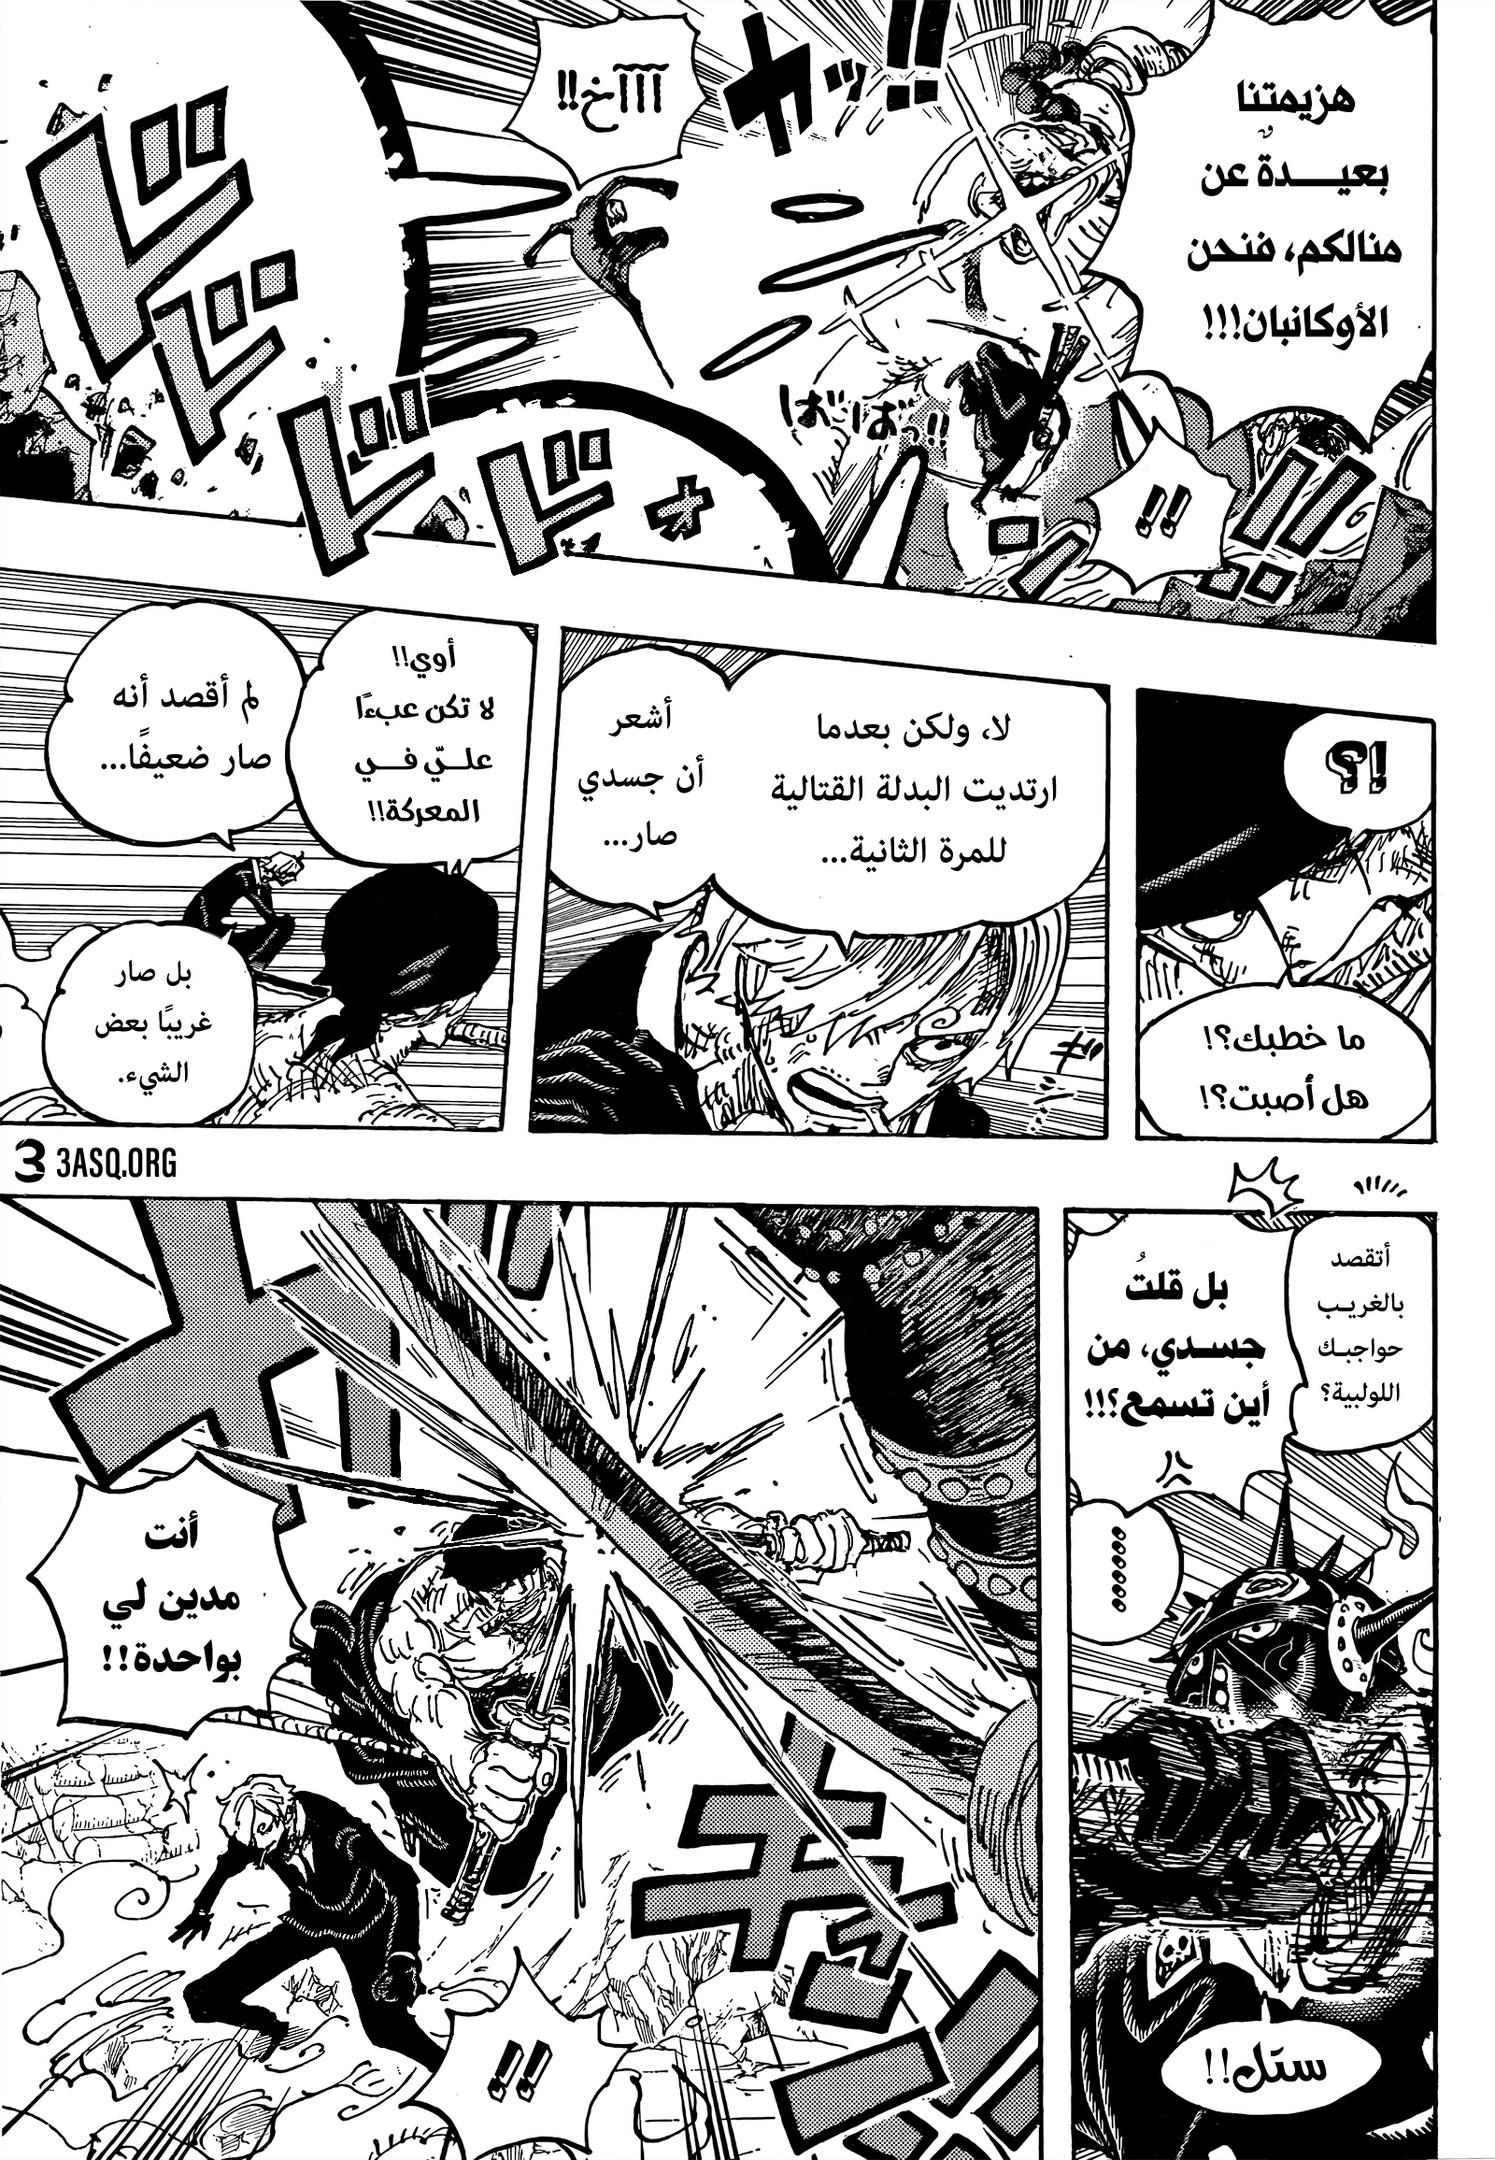 One Piece Arab 1023, image №6